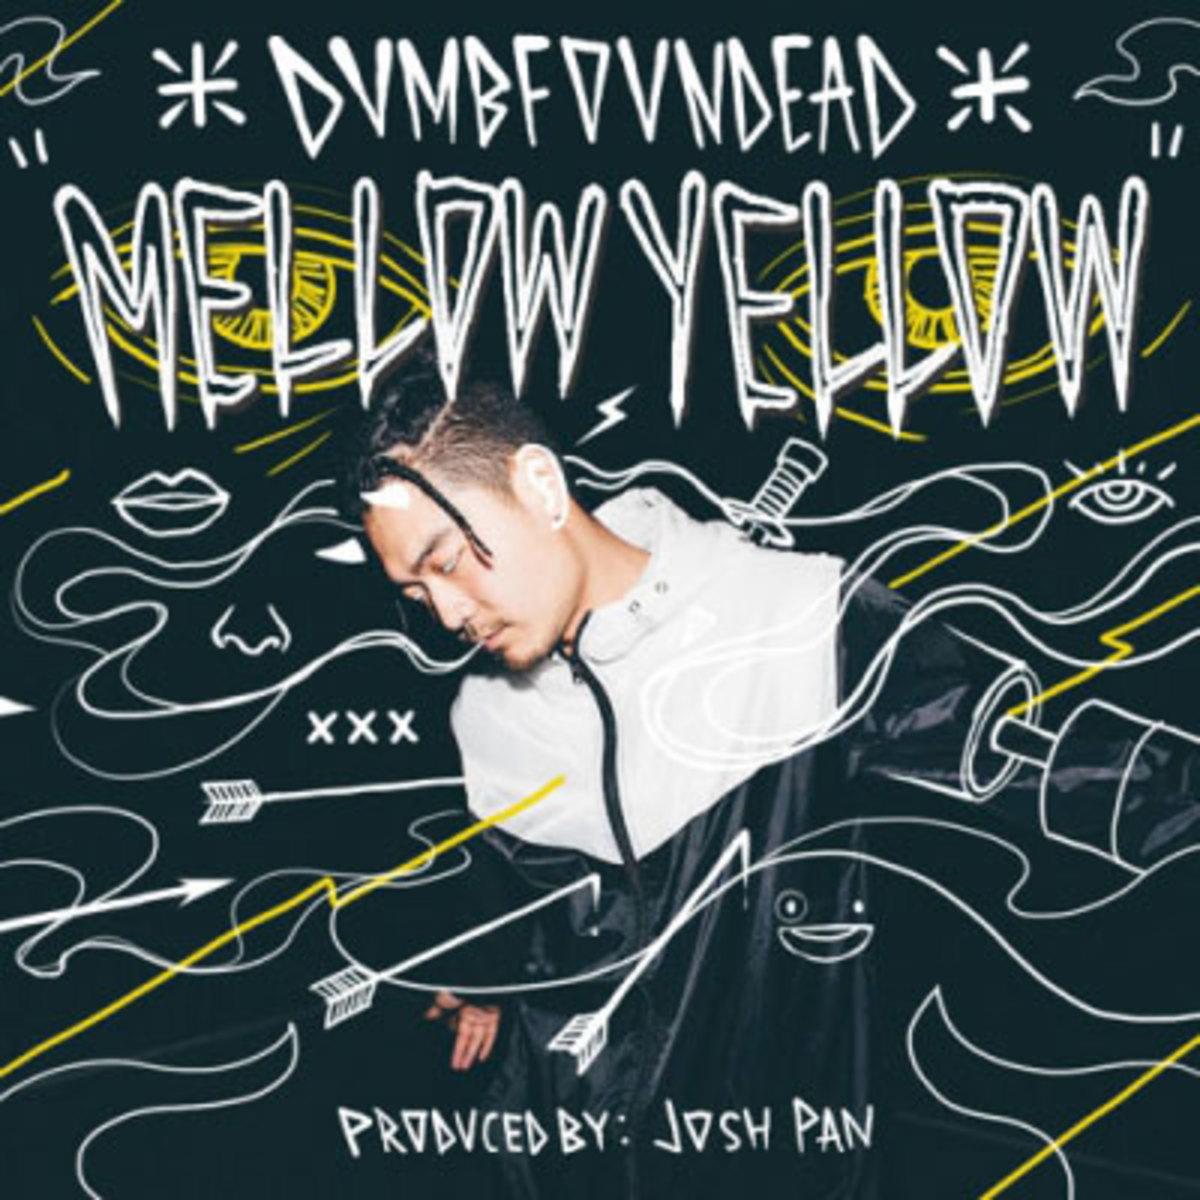 dumbfoundead-mellow-yellow.jpg